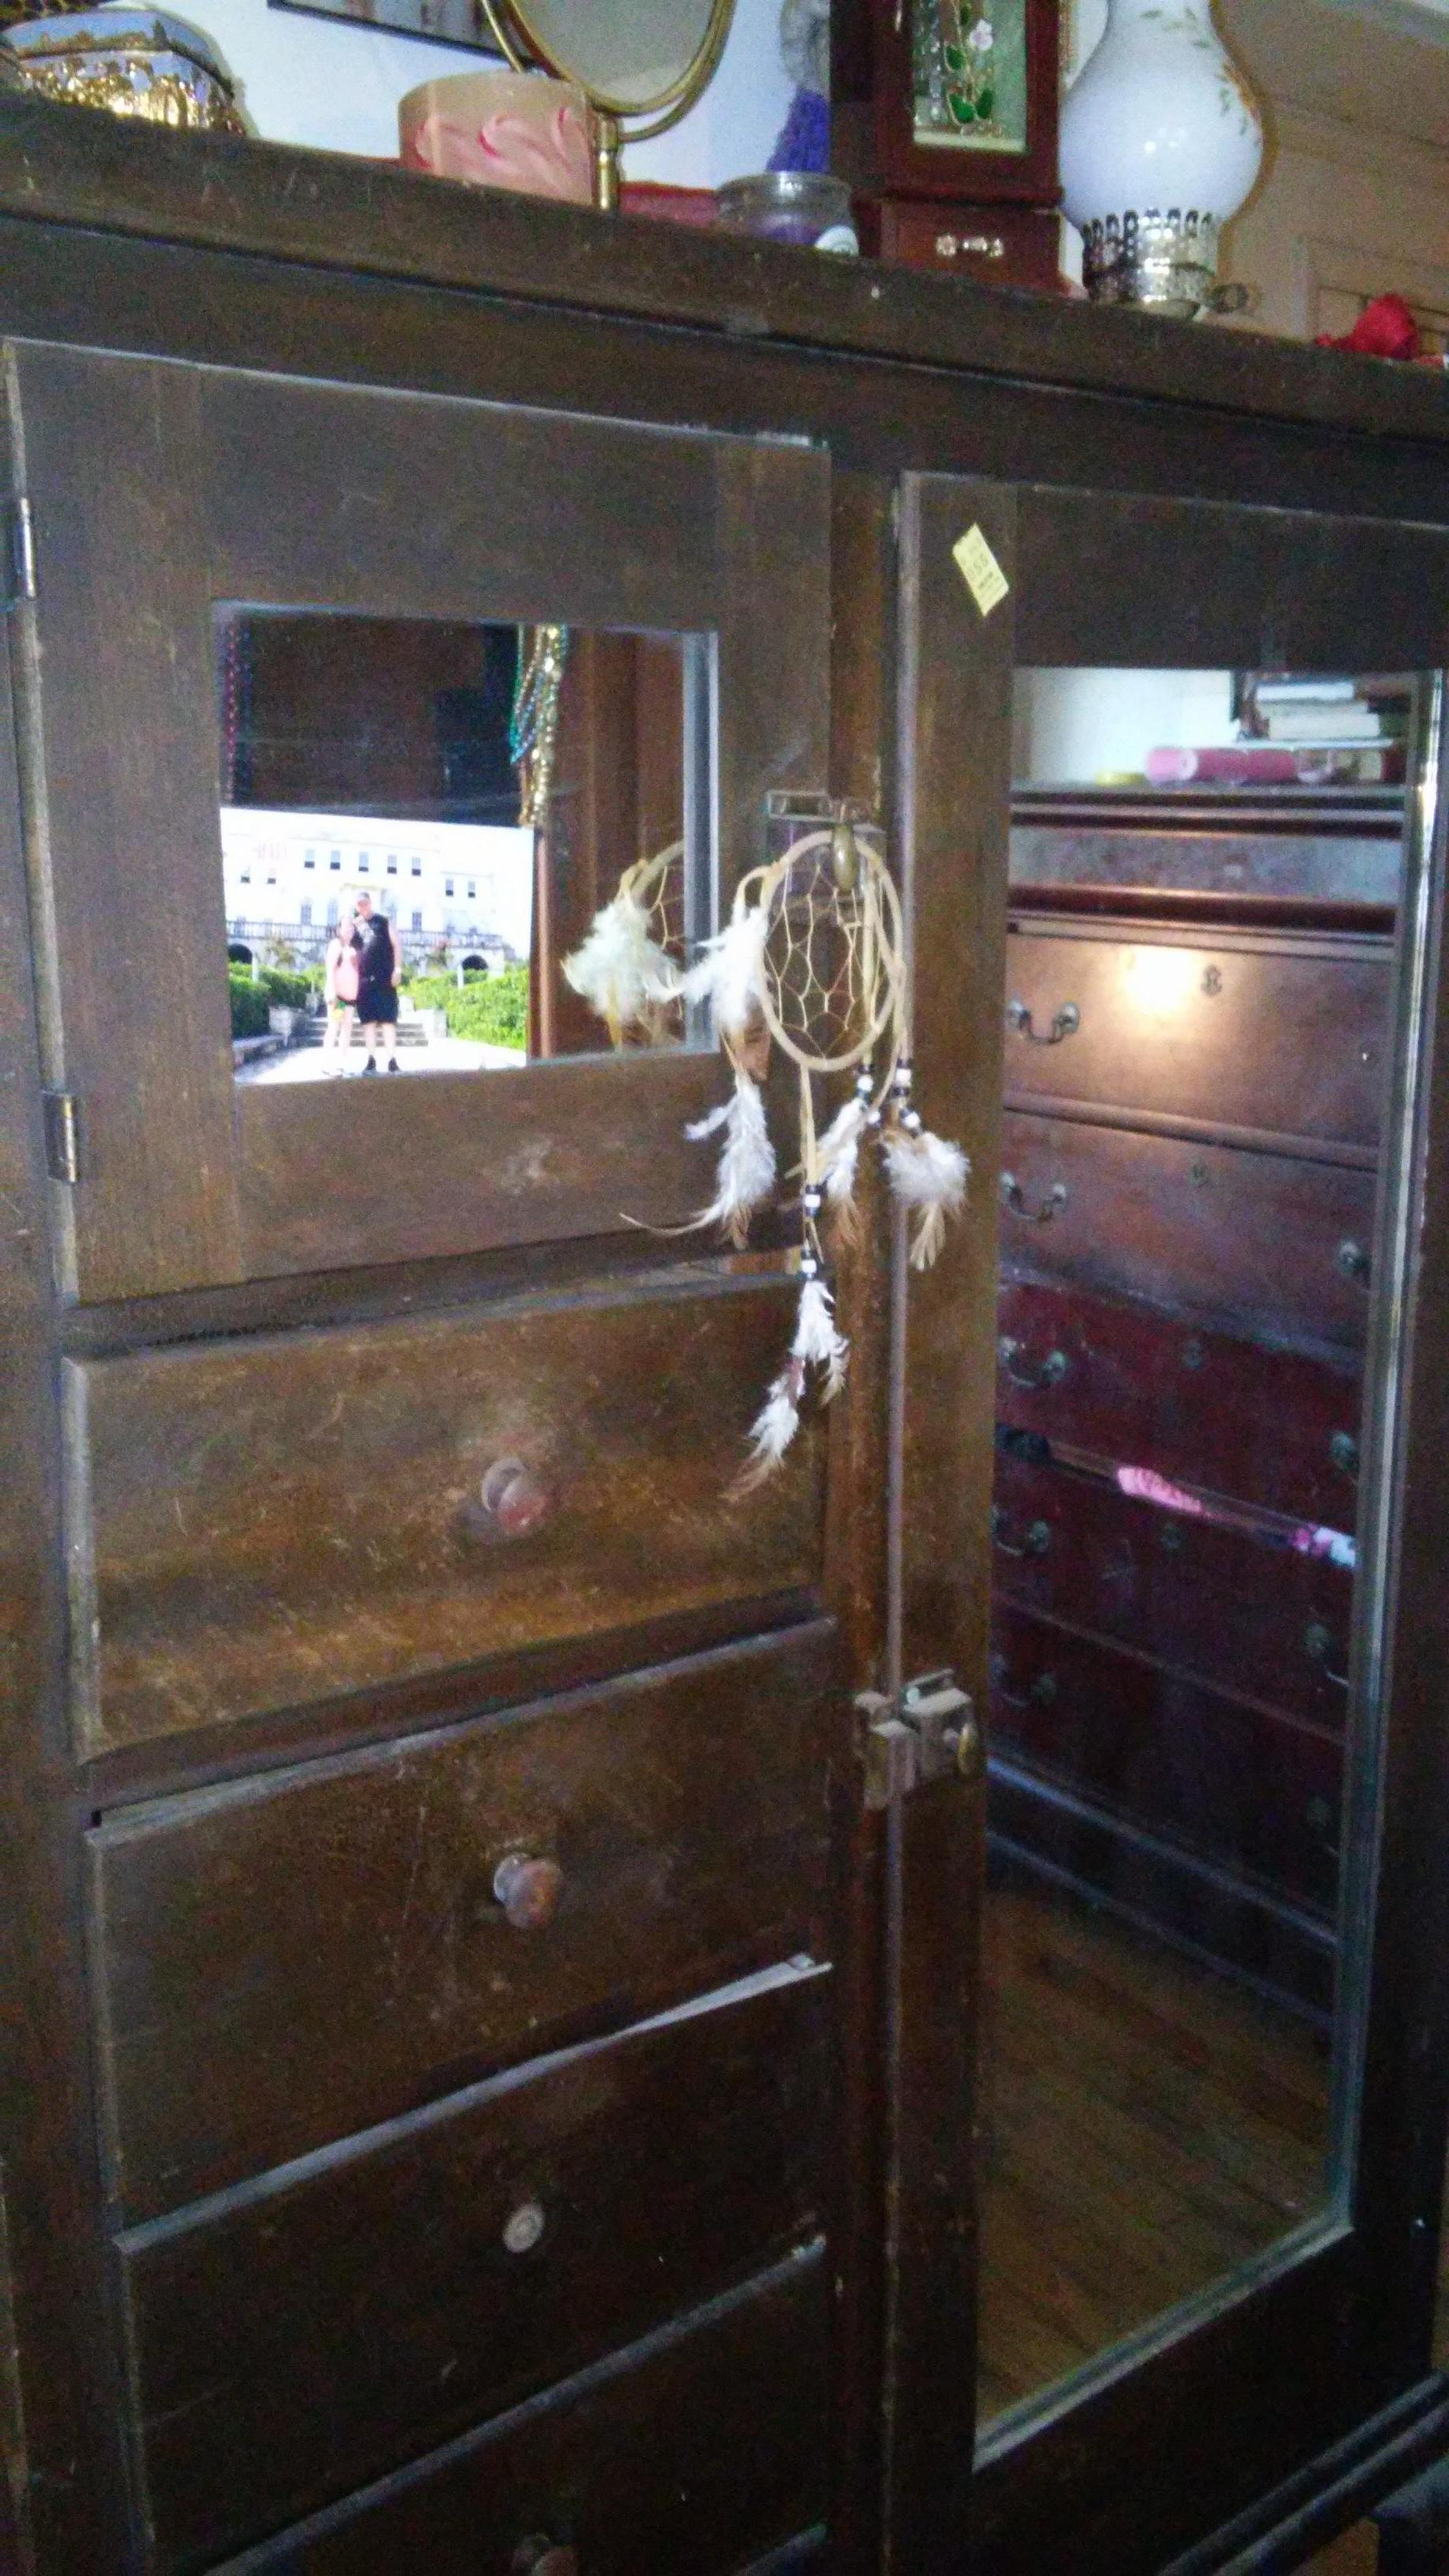 antique chifferobe with mirror Antique chifferobe 2 mirror antique appraisal | InstAppraisal antique chifferobe with mirror